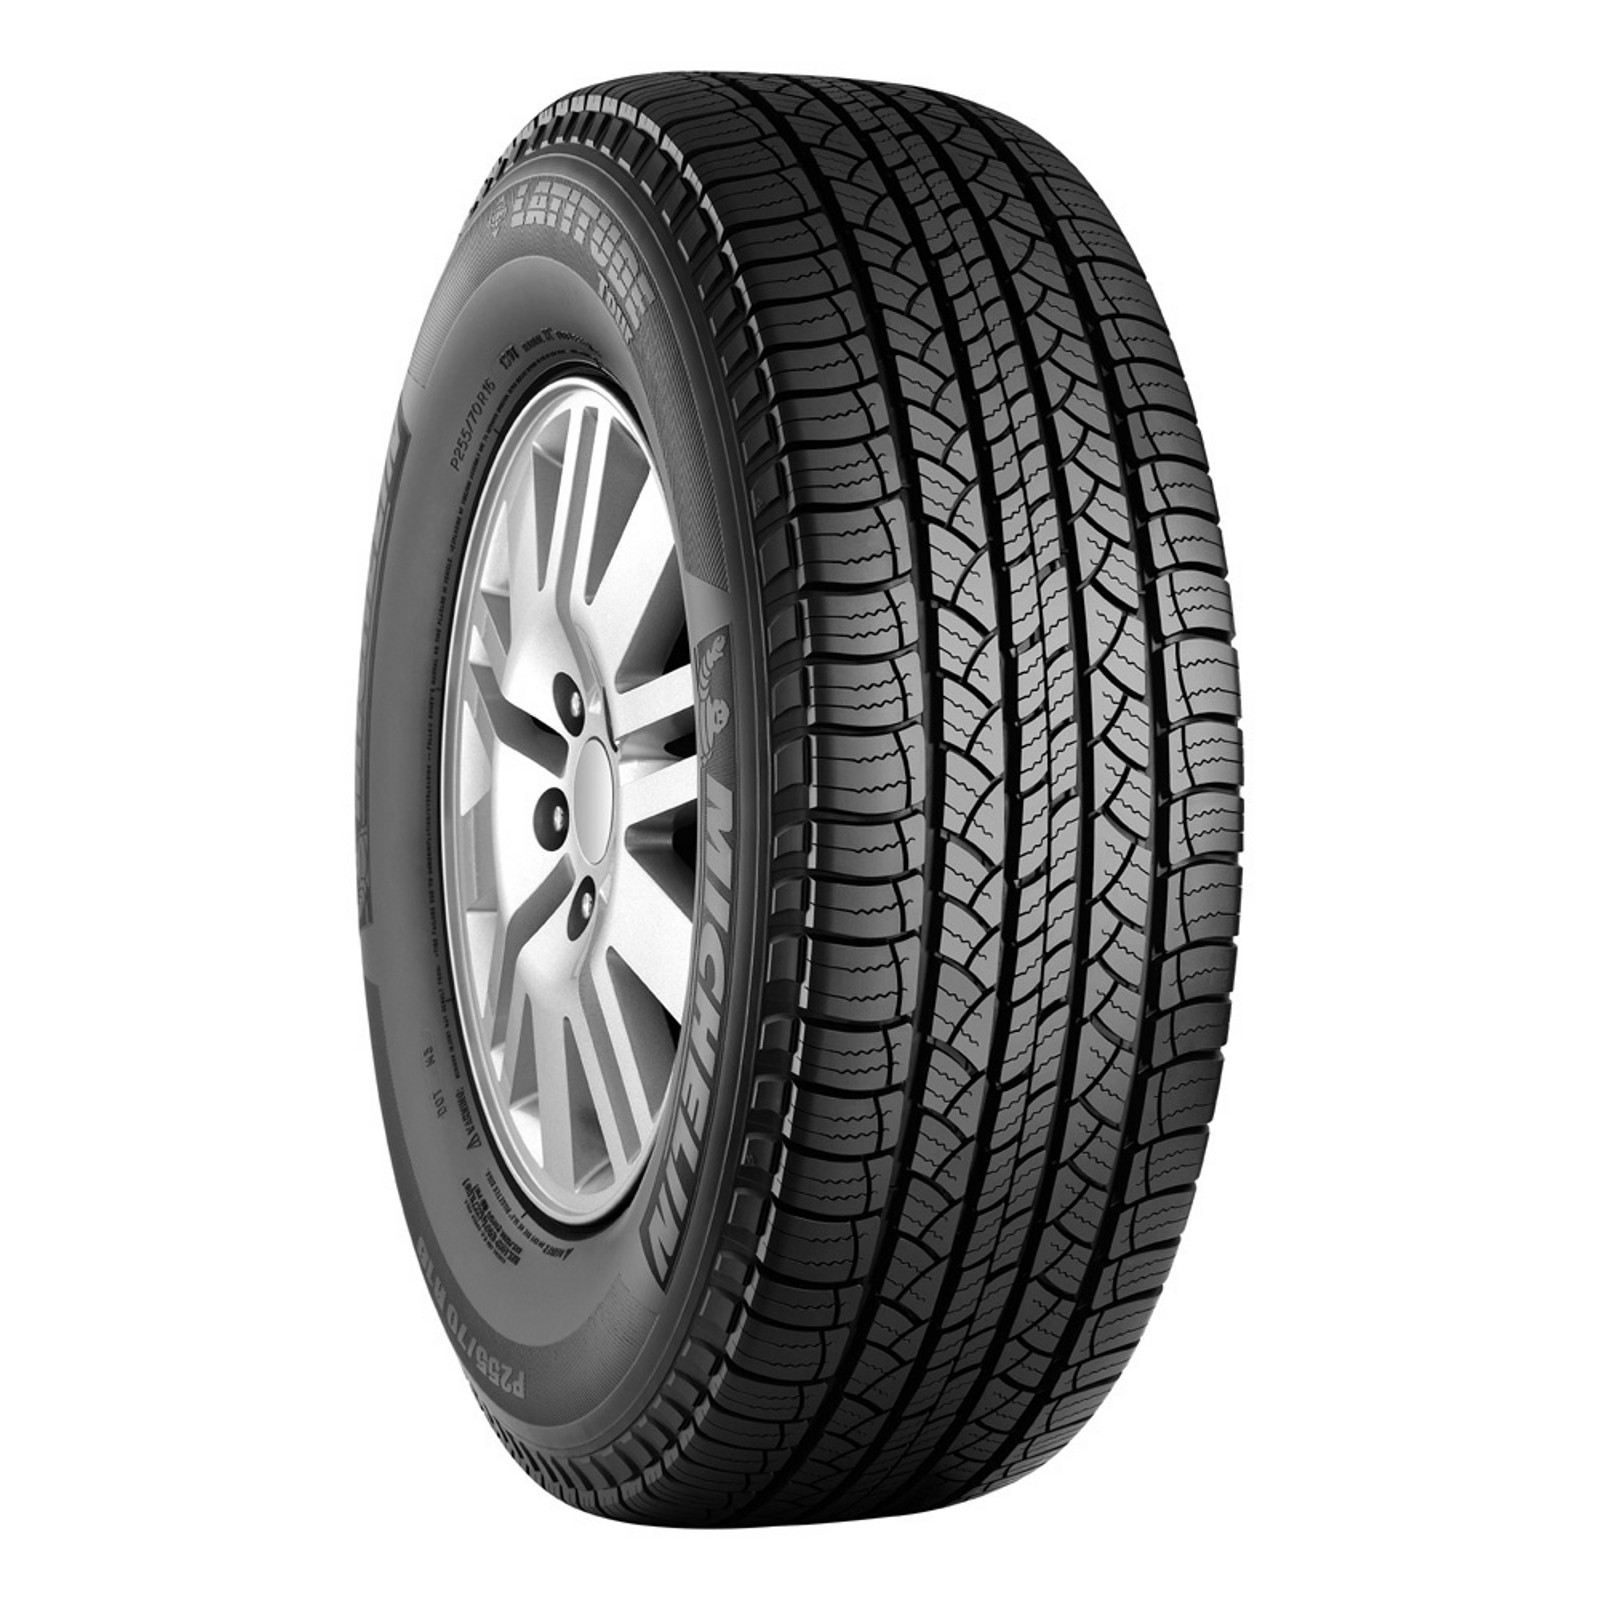 Top 10 Best Winter Tires for 2017